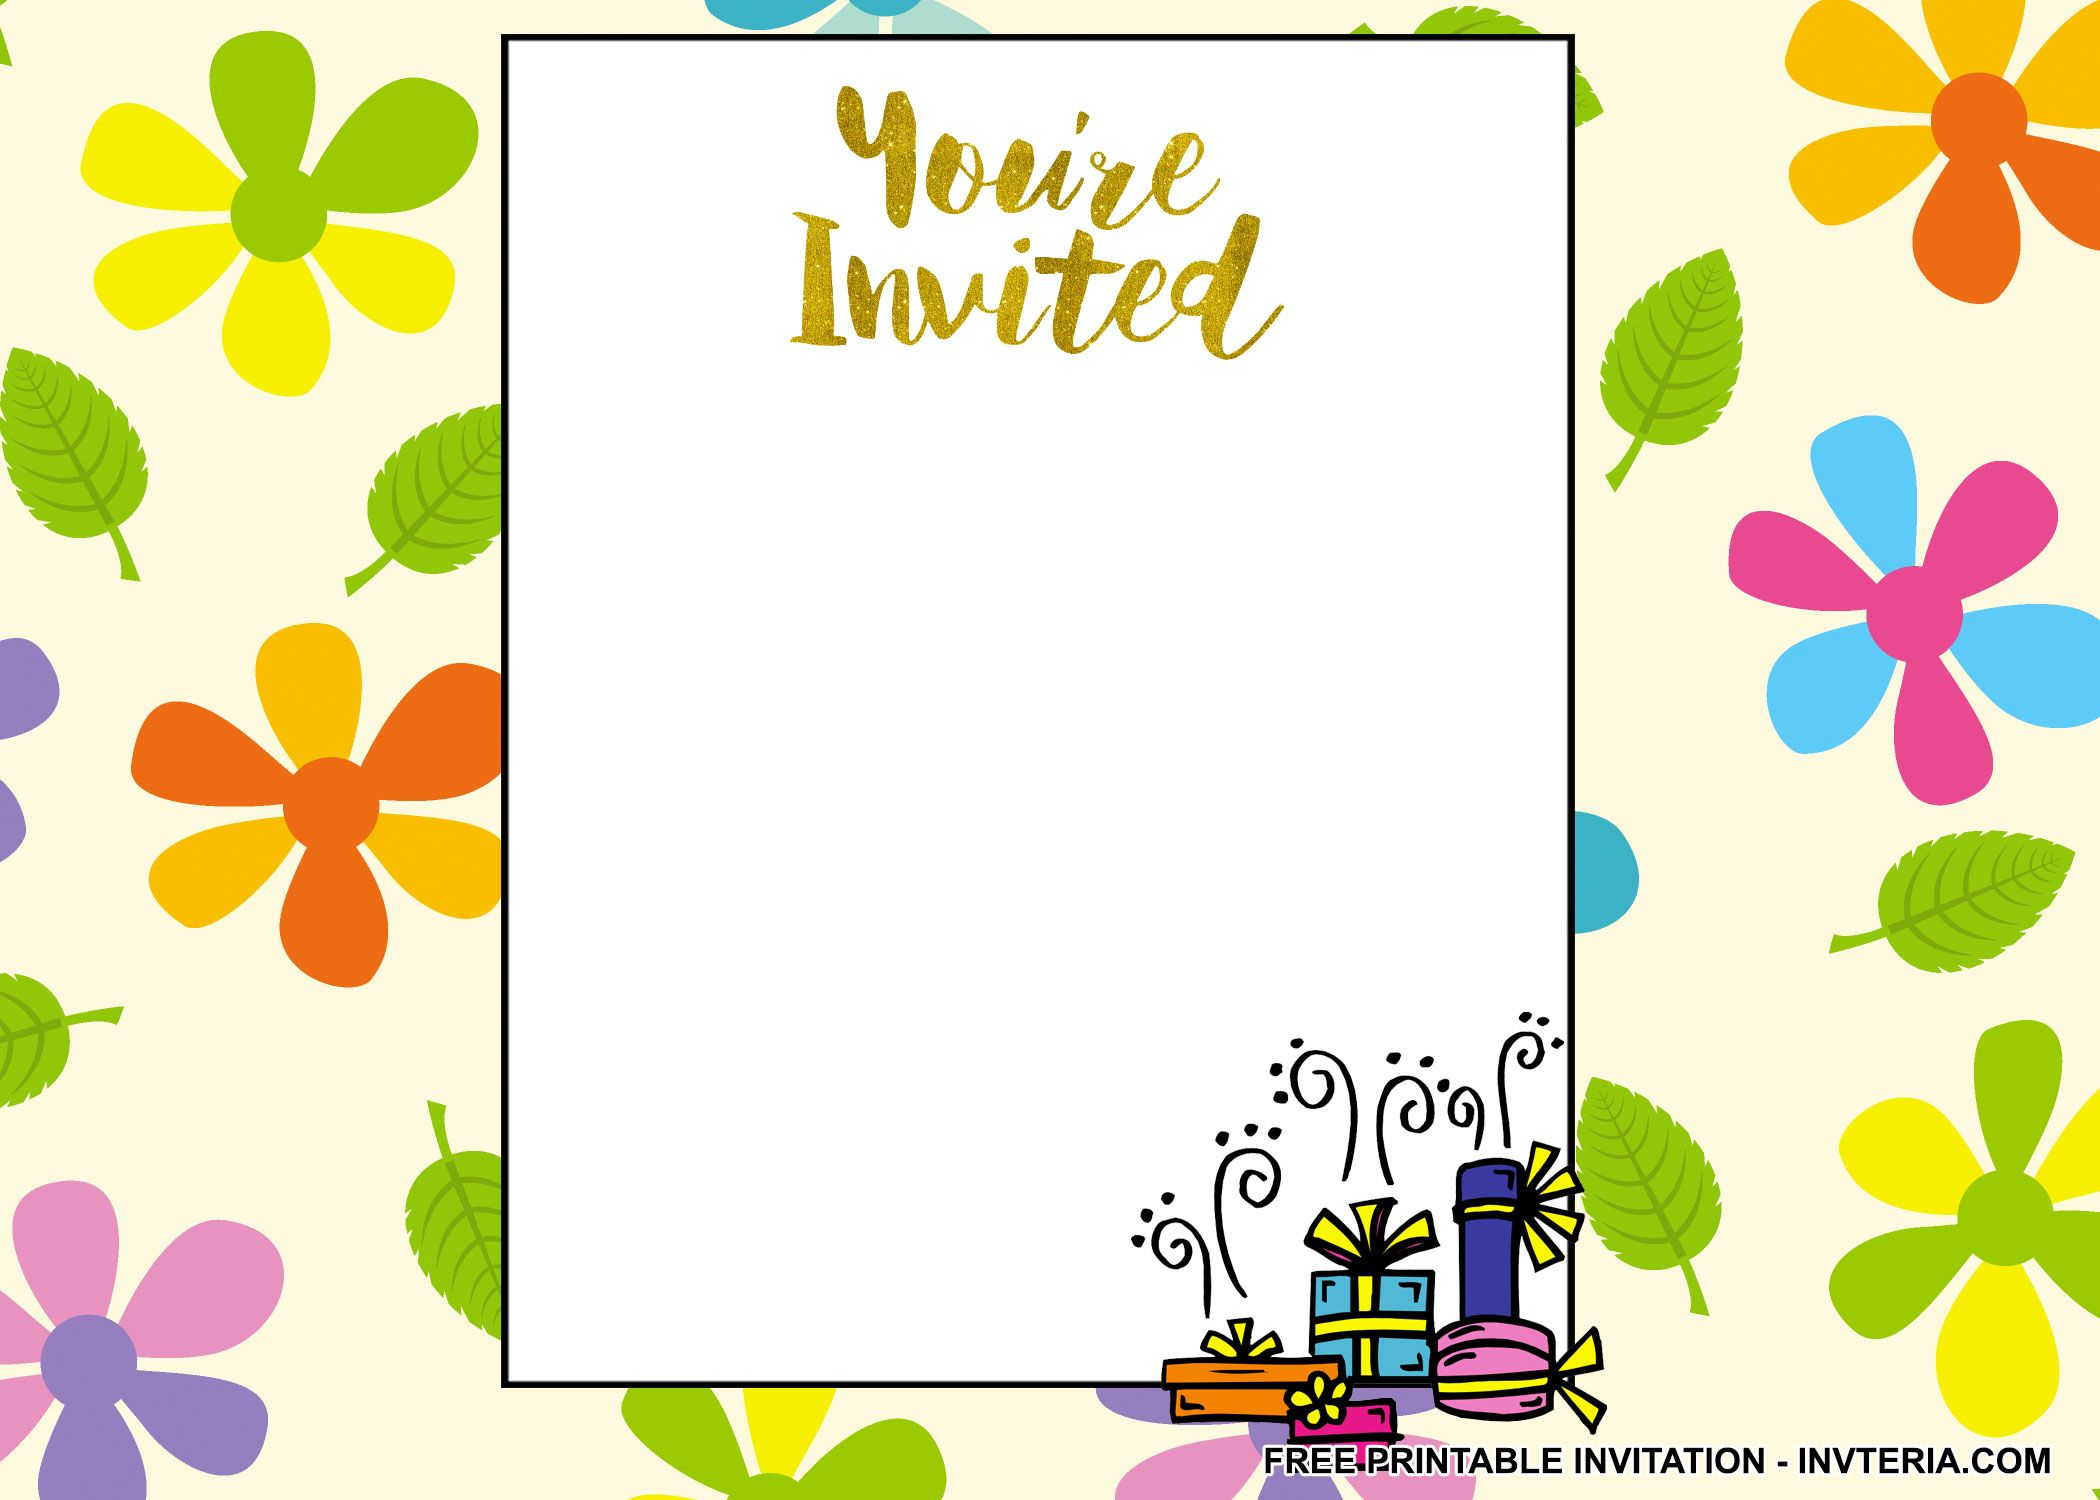 6th birthday invitation wording idea